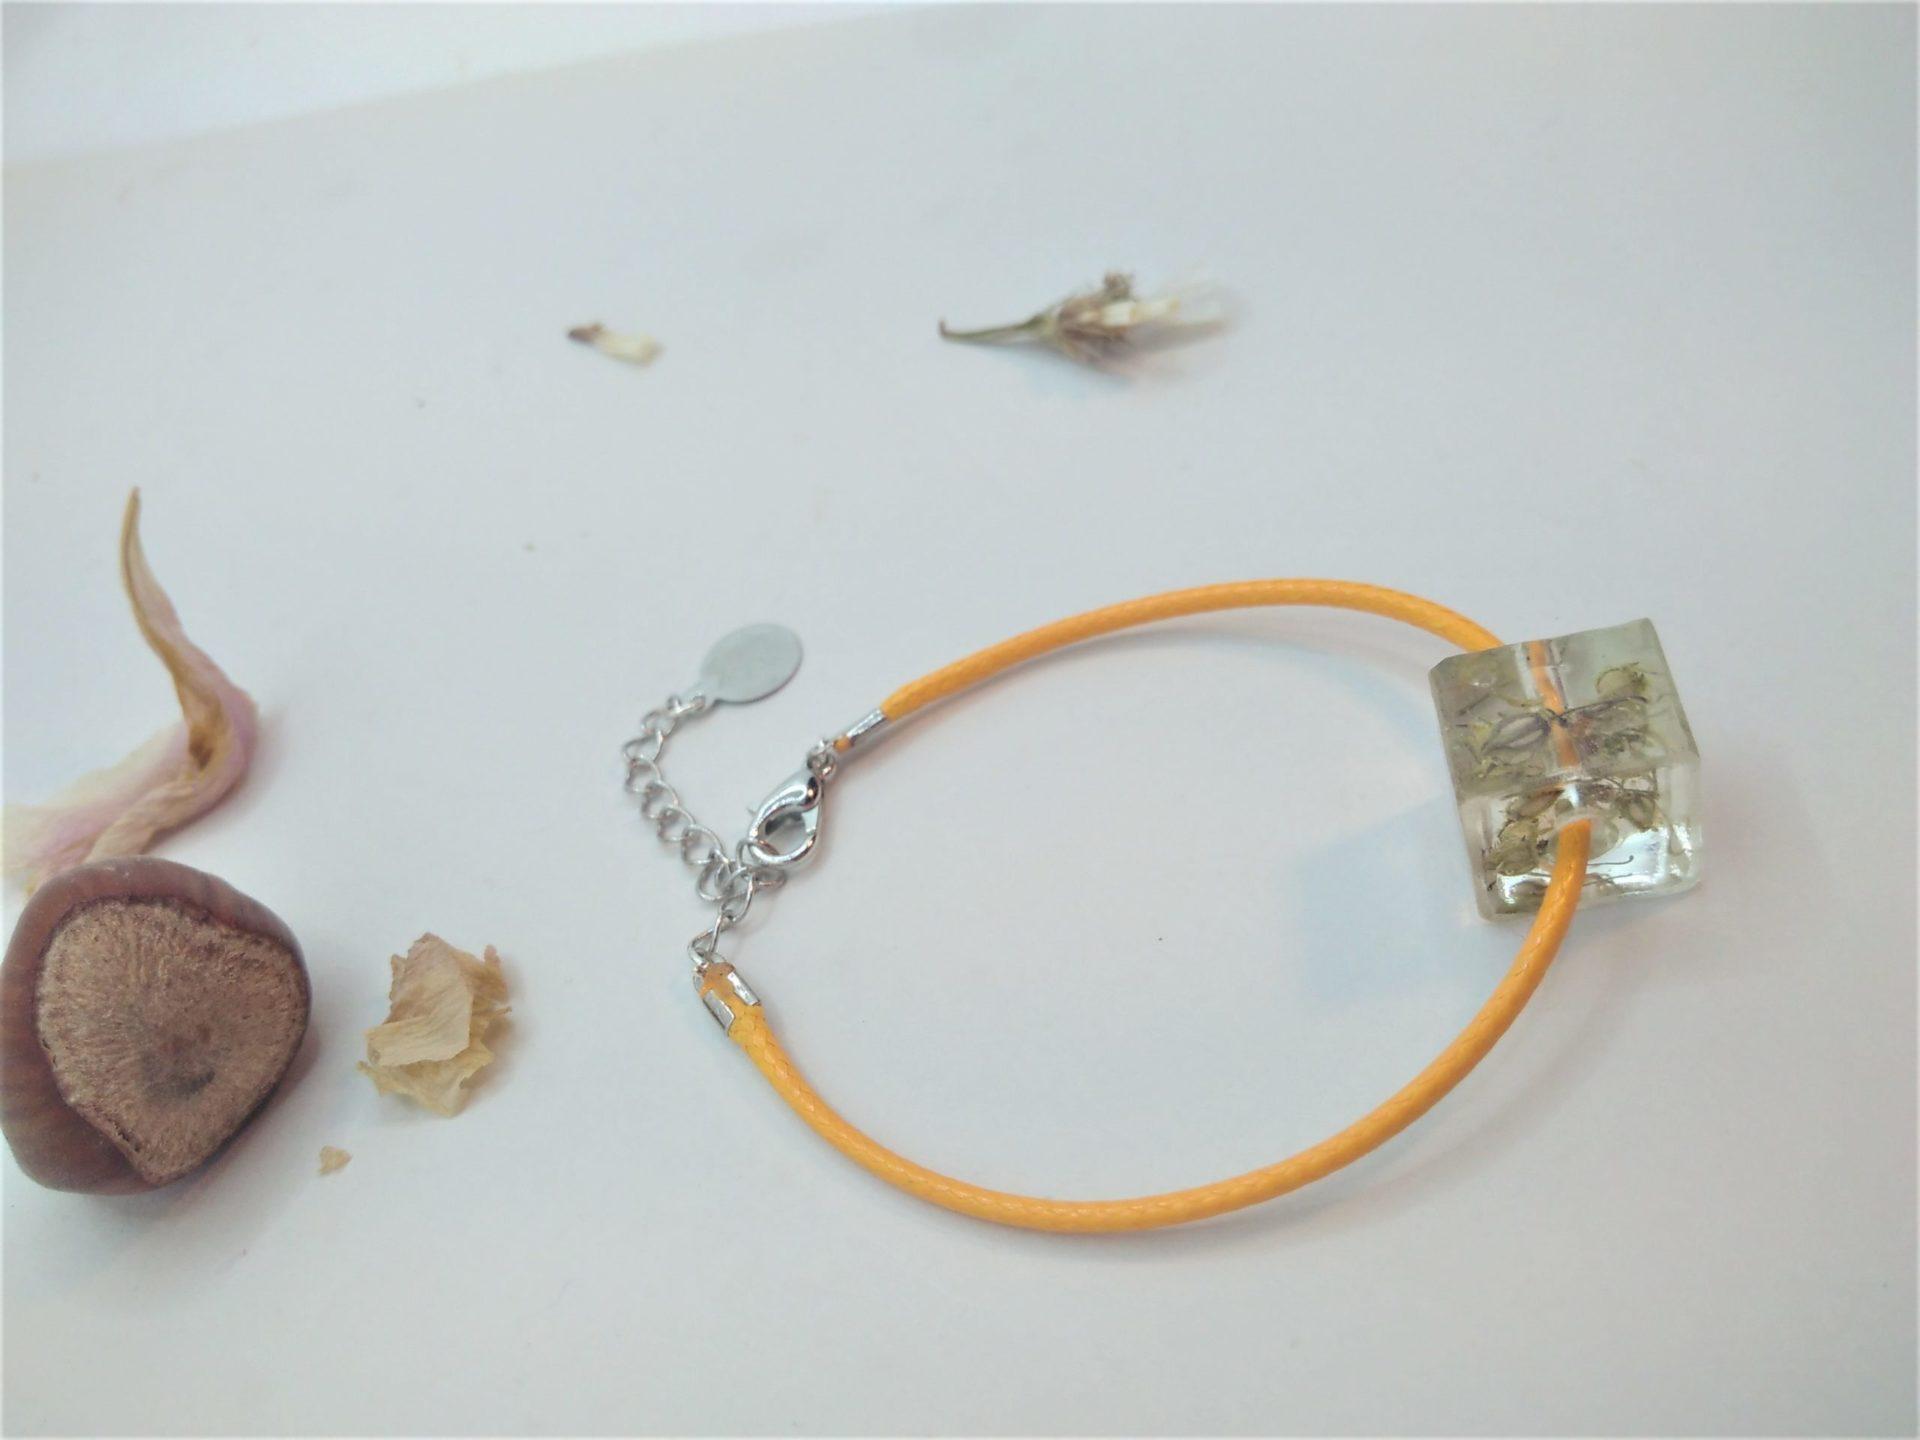 Bcf13 - 18€ - bracelet cube fleurs